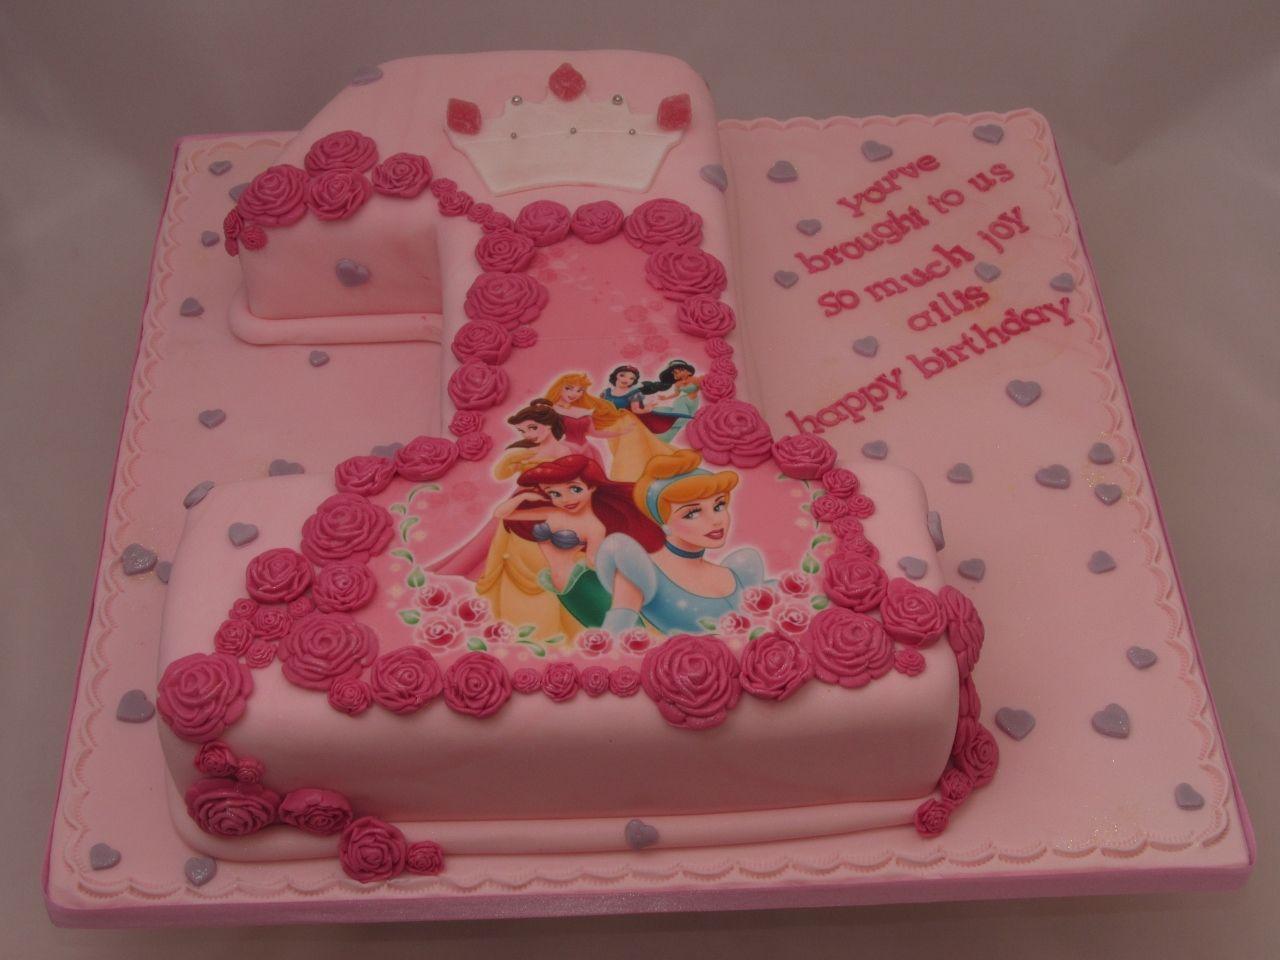 Disney Princesses 1st Birthday Cake The Way Cakepins For My